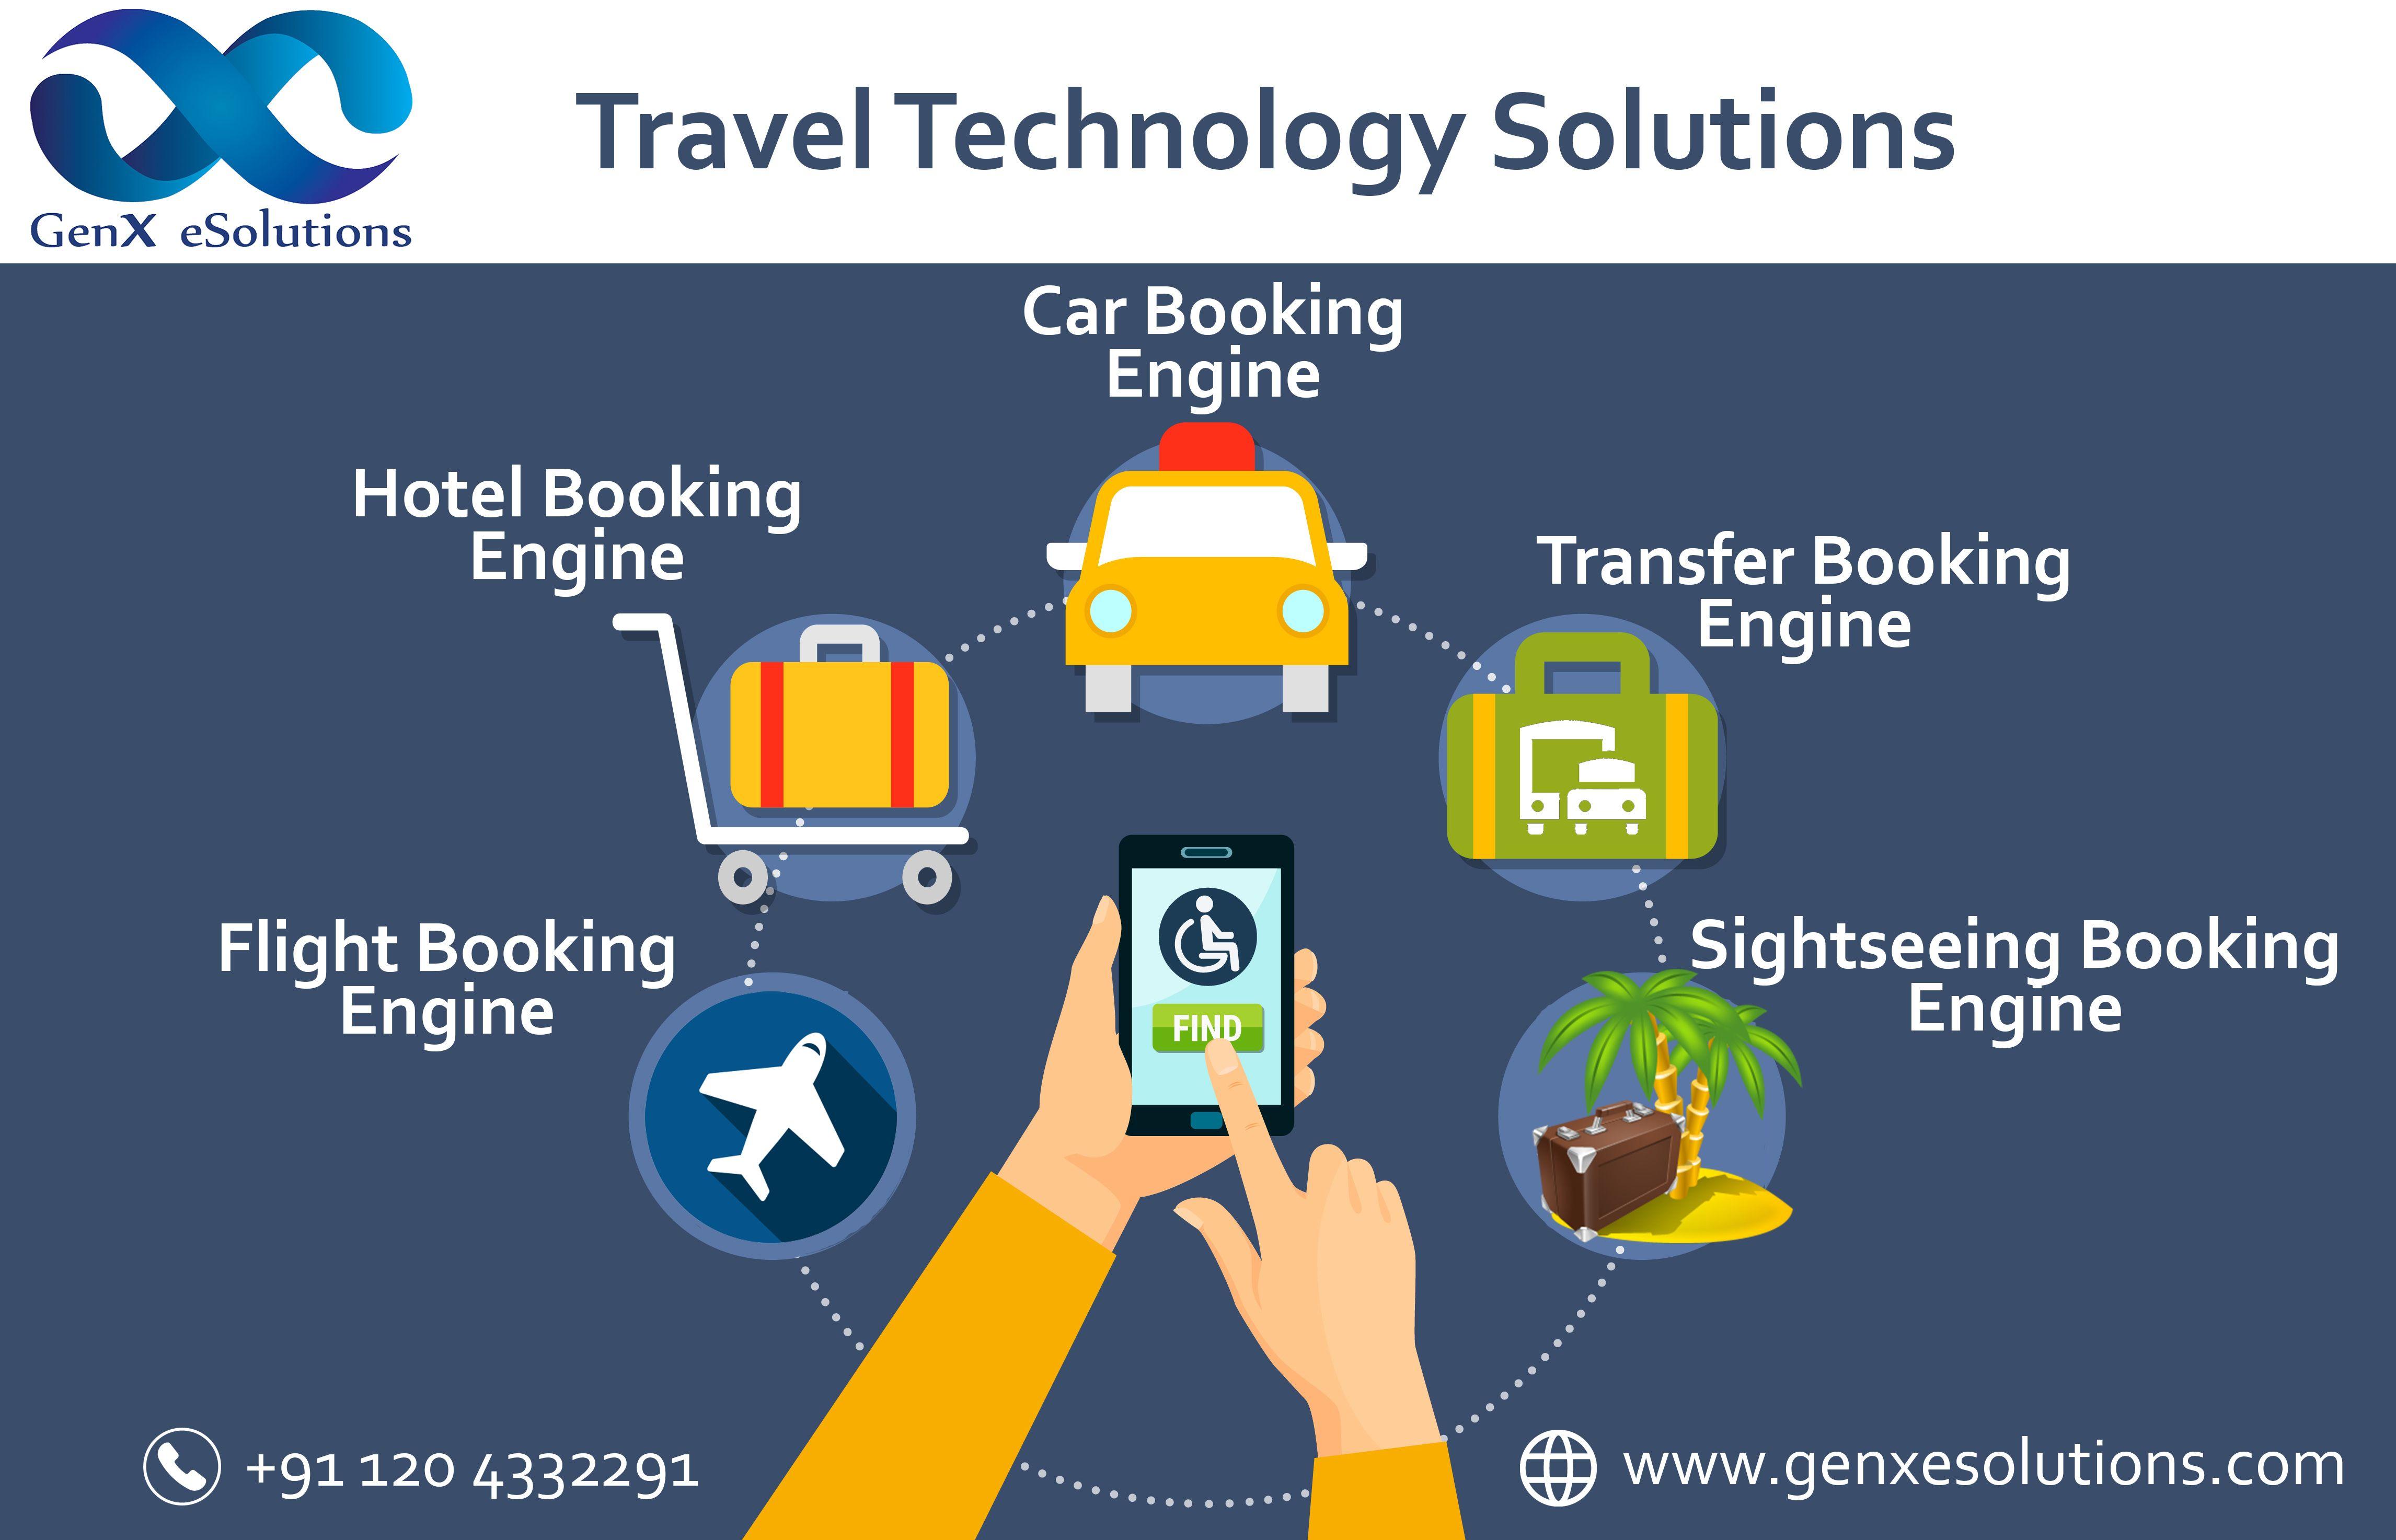 Travel Technology Company for OTA's, DMC's, Travel Agents